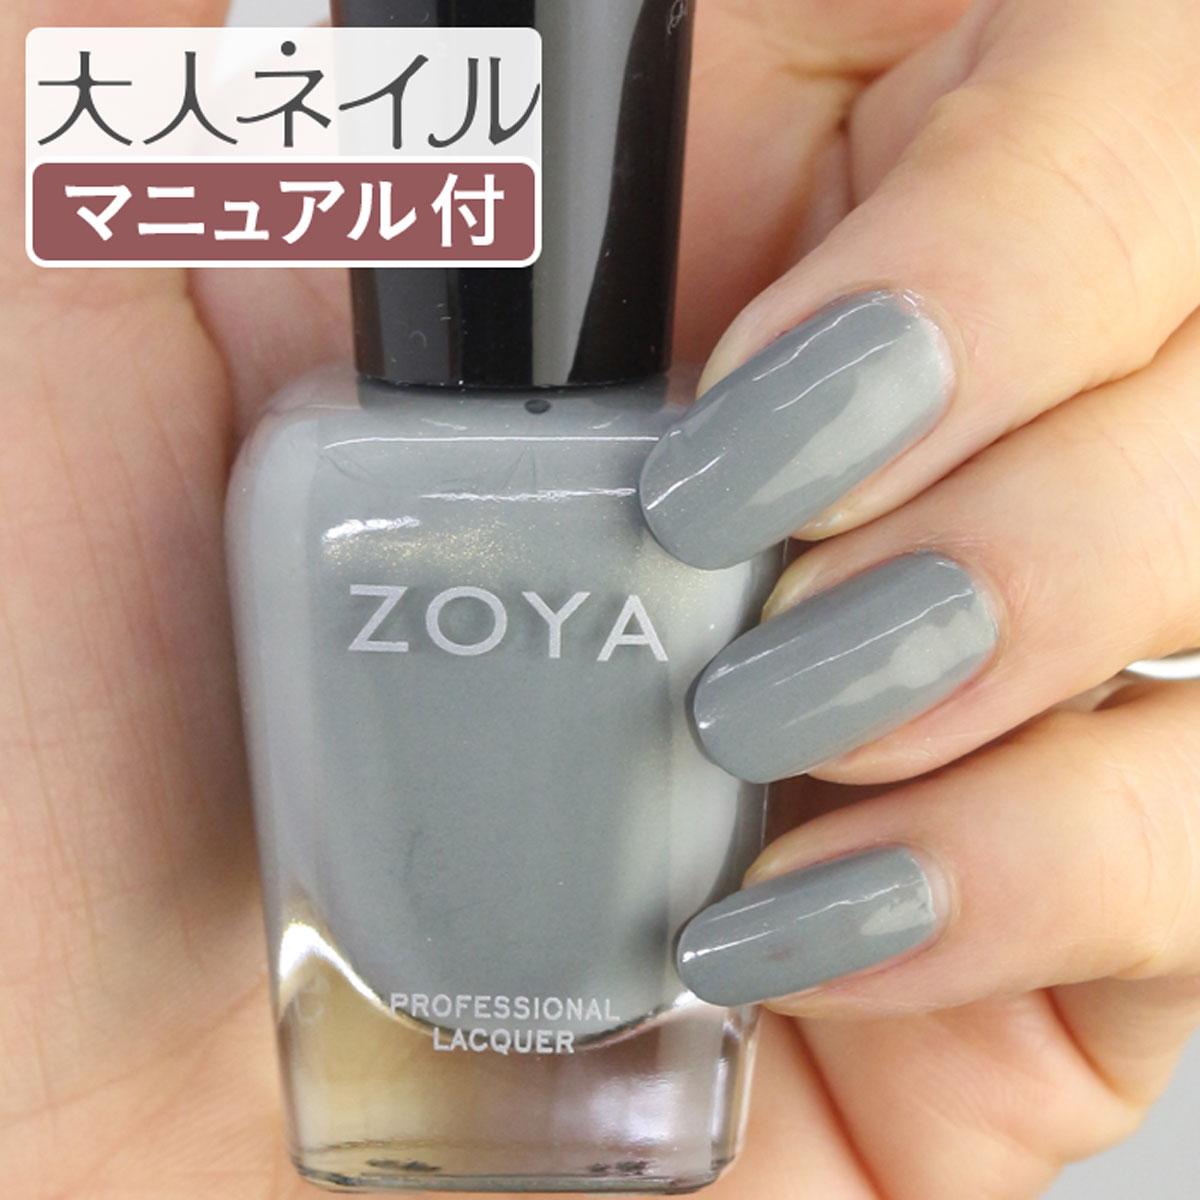 ZOYA ゾーヤ ゾヤ ネイルカラー ZP982 15mL Fern 自爪 の為に作られた ネイル にやさしい 自然派 マニキュア zoya セルフネイル にもおすすめ パール グレー